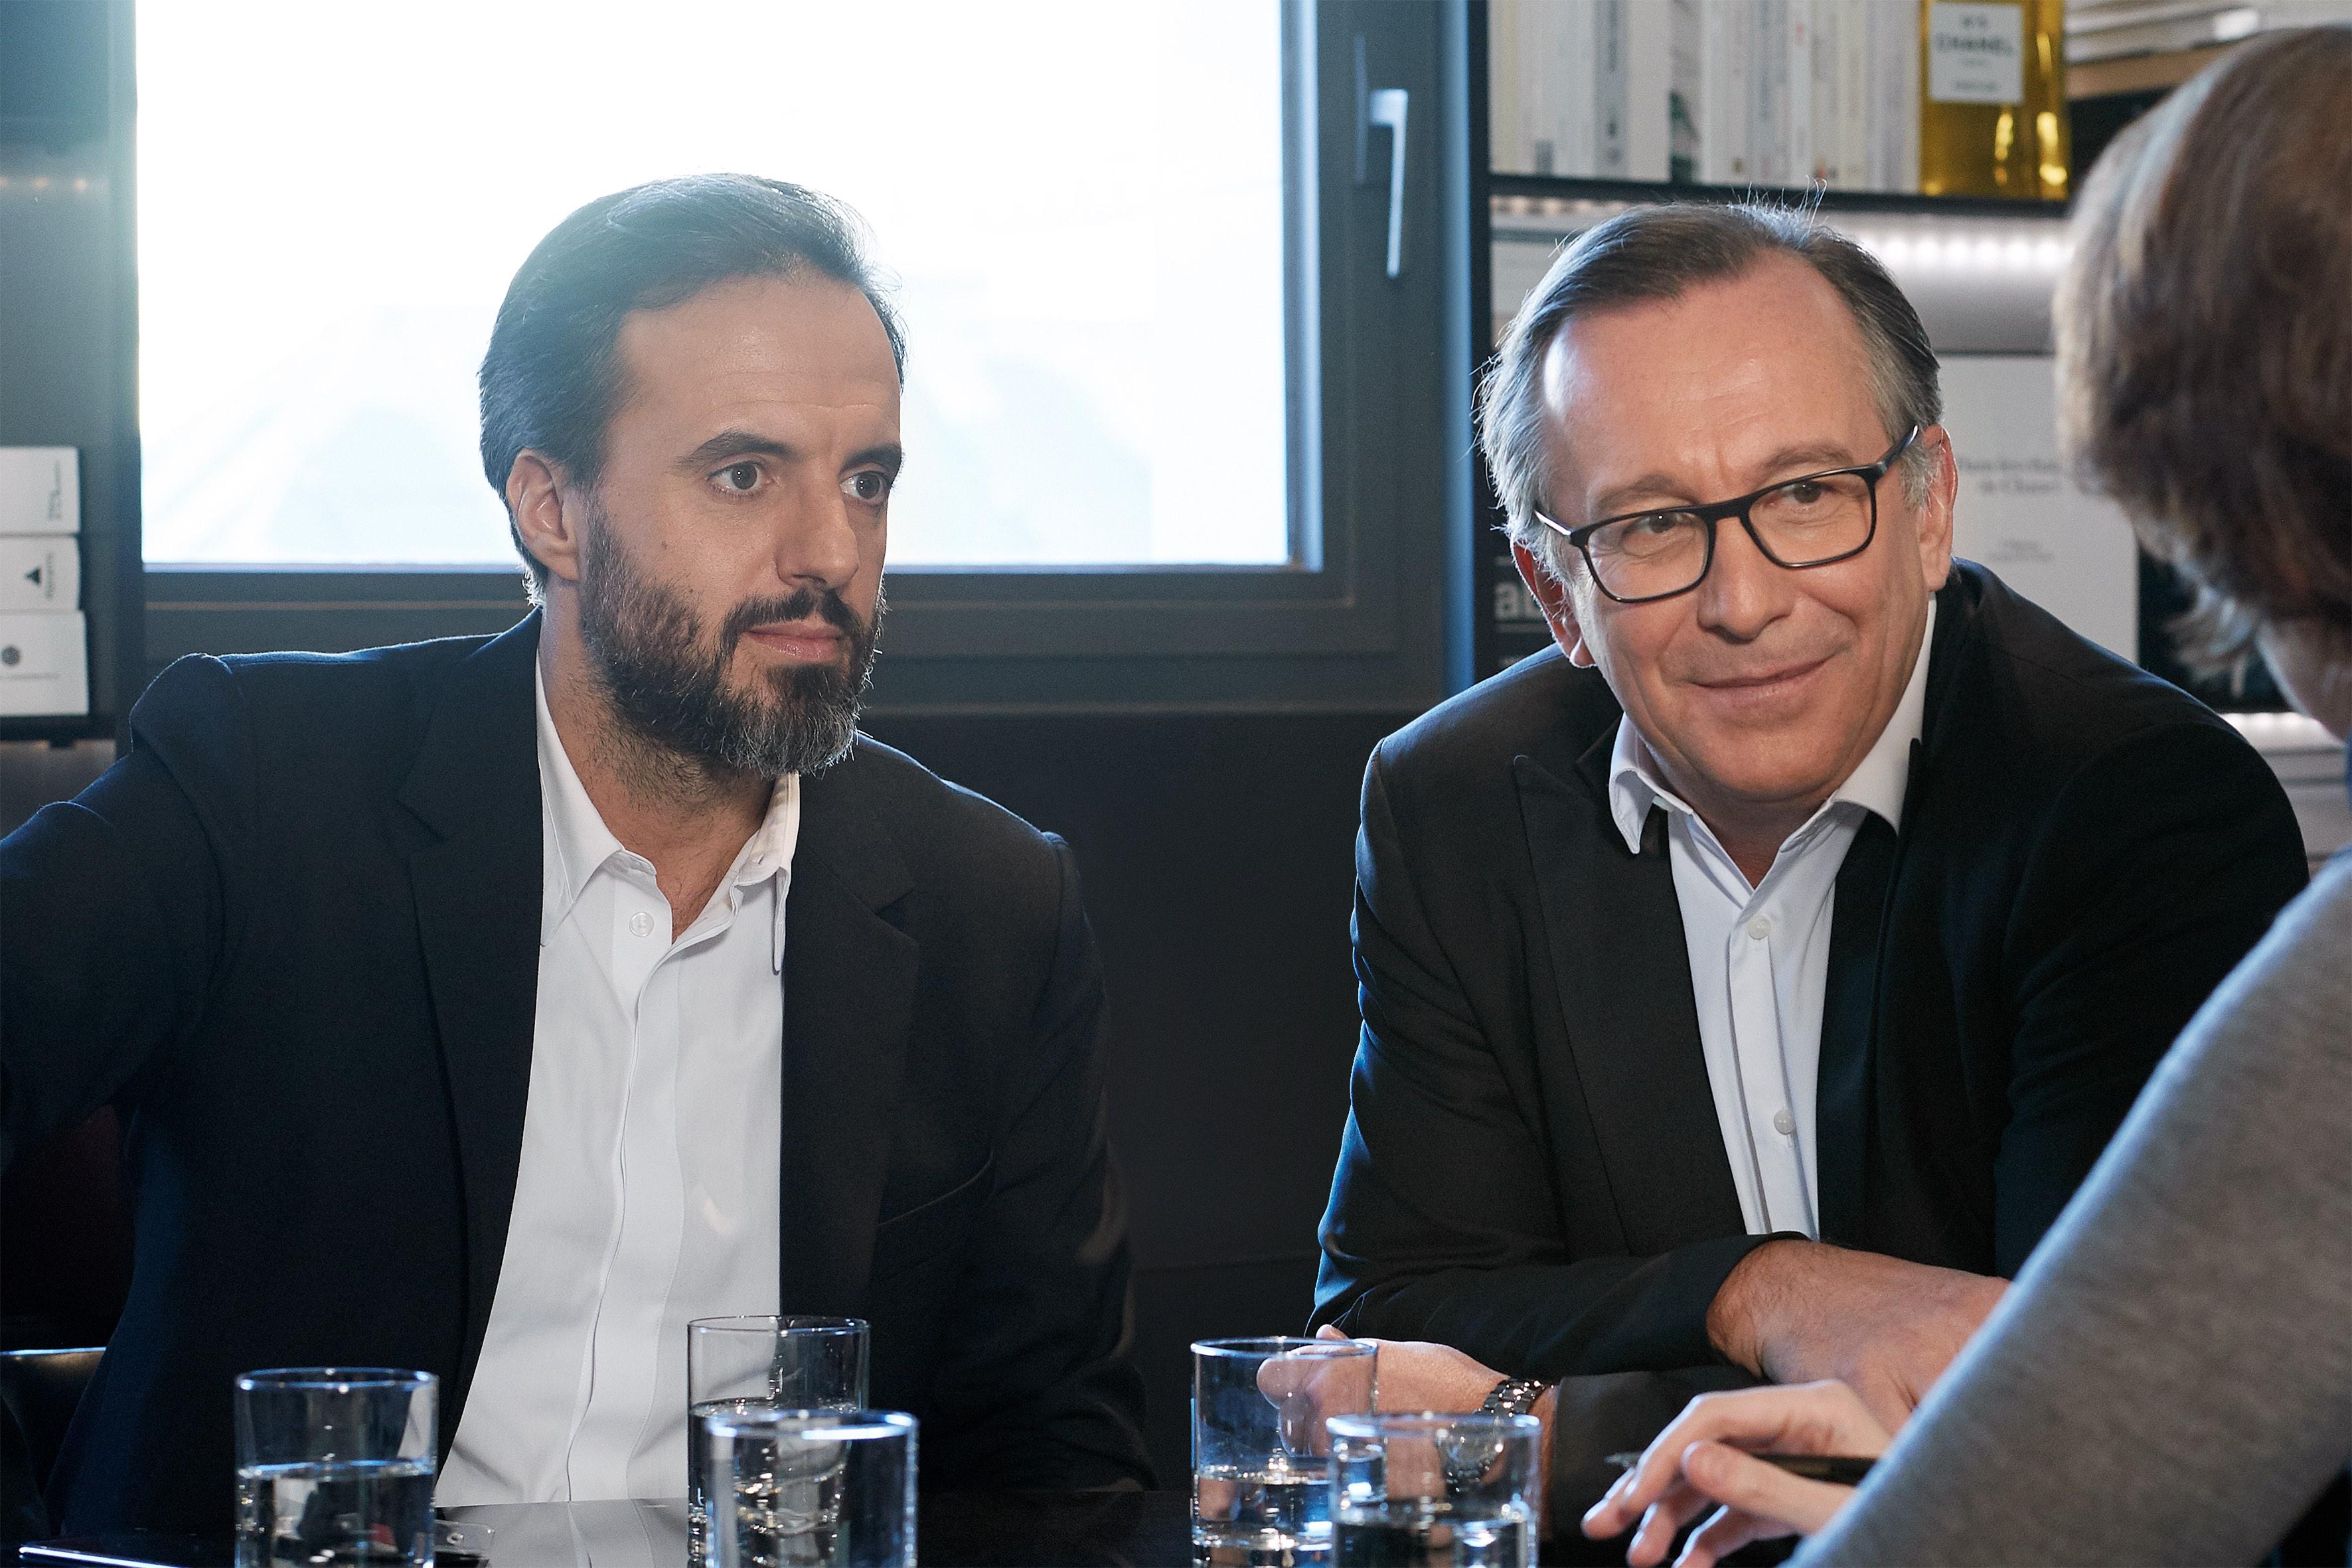 Jose Neves and Bruno Pavlovsky